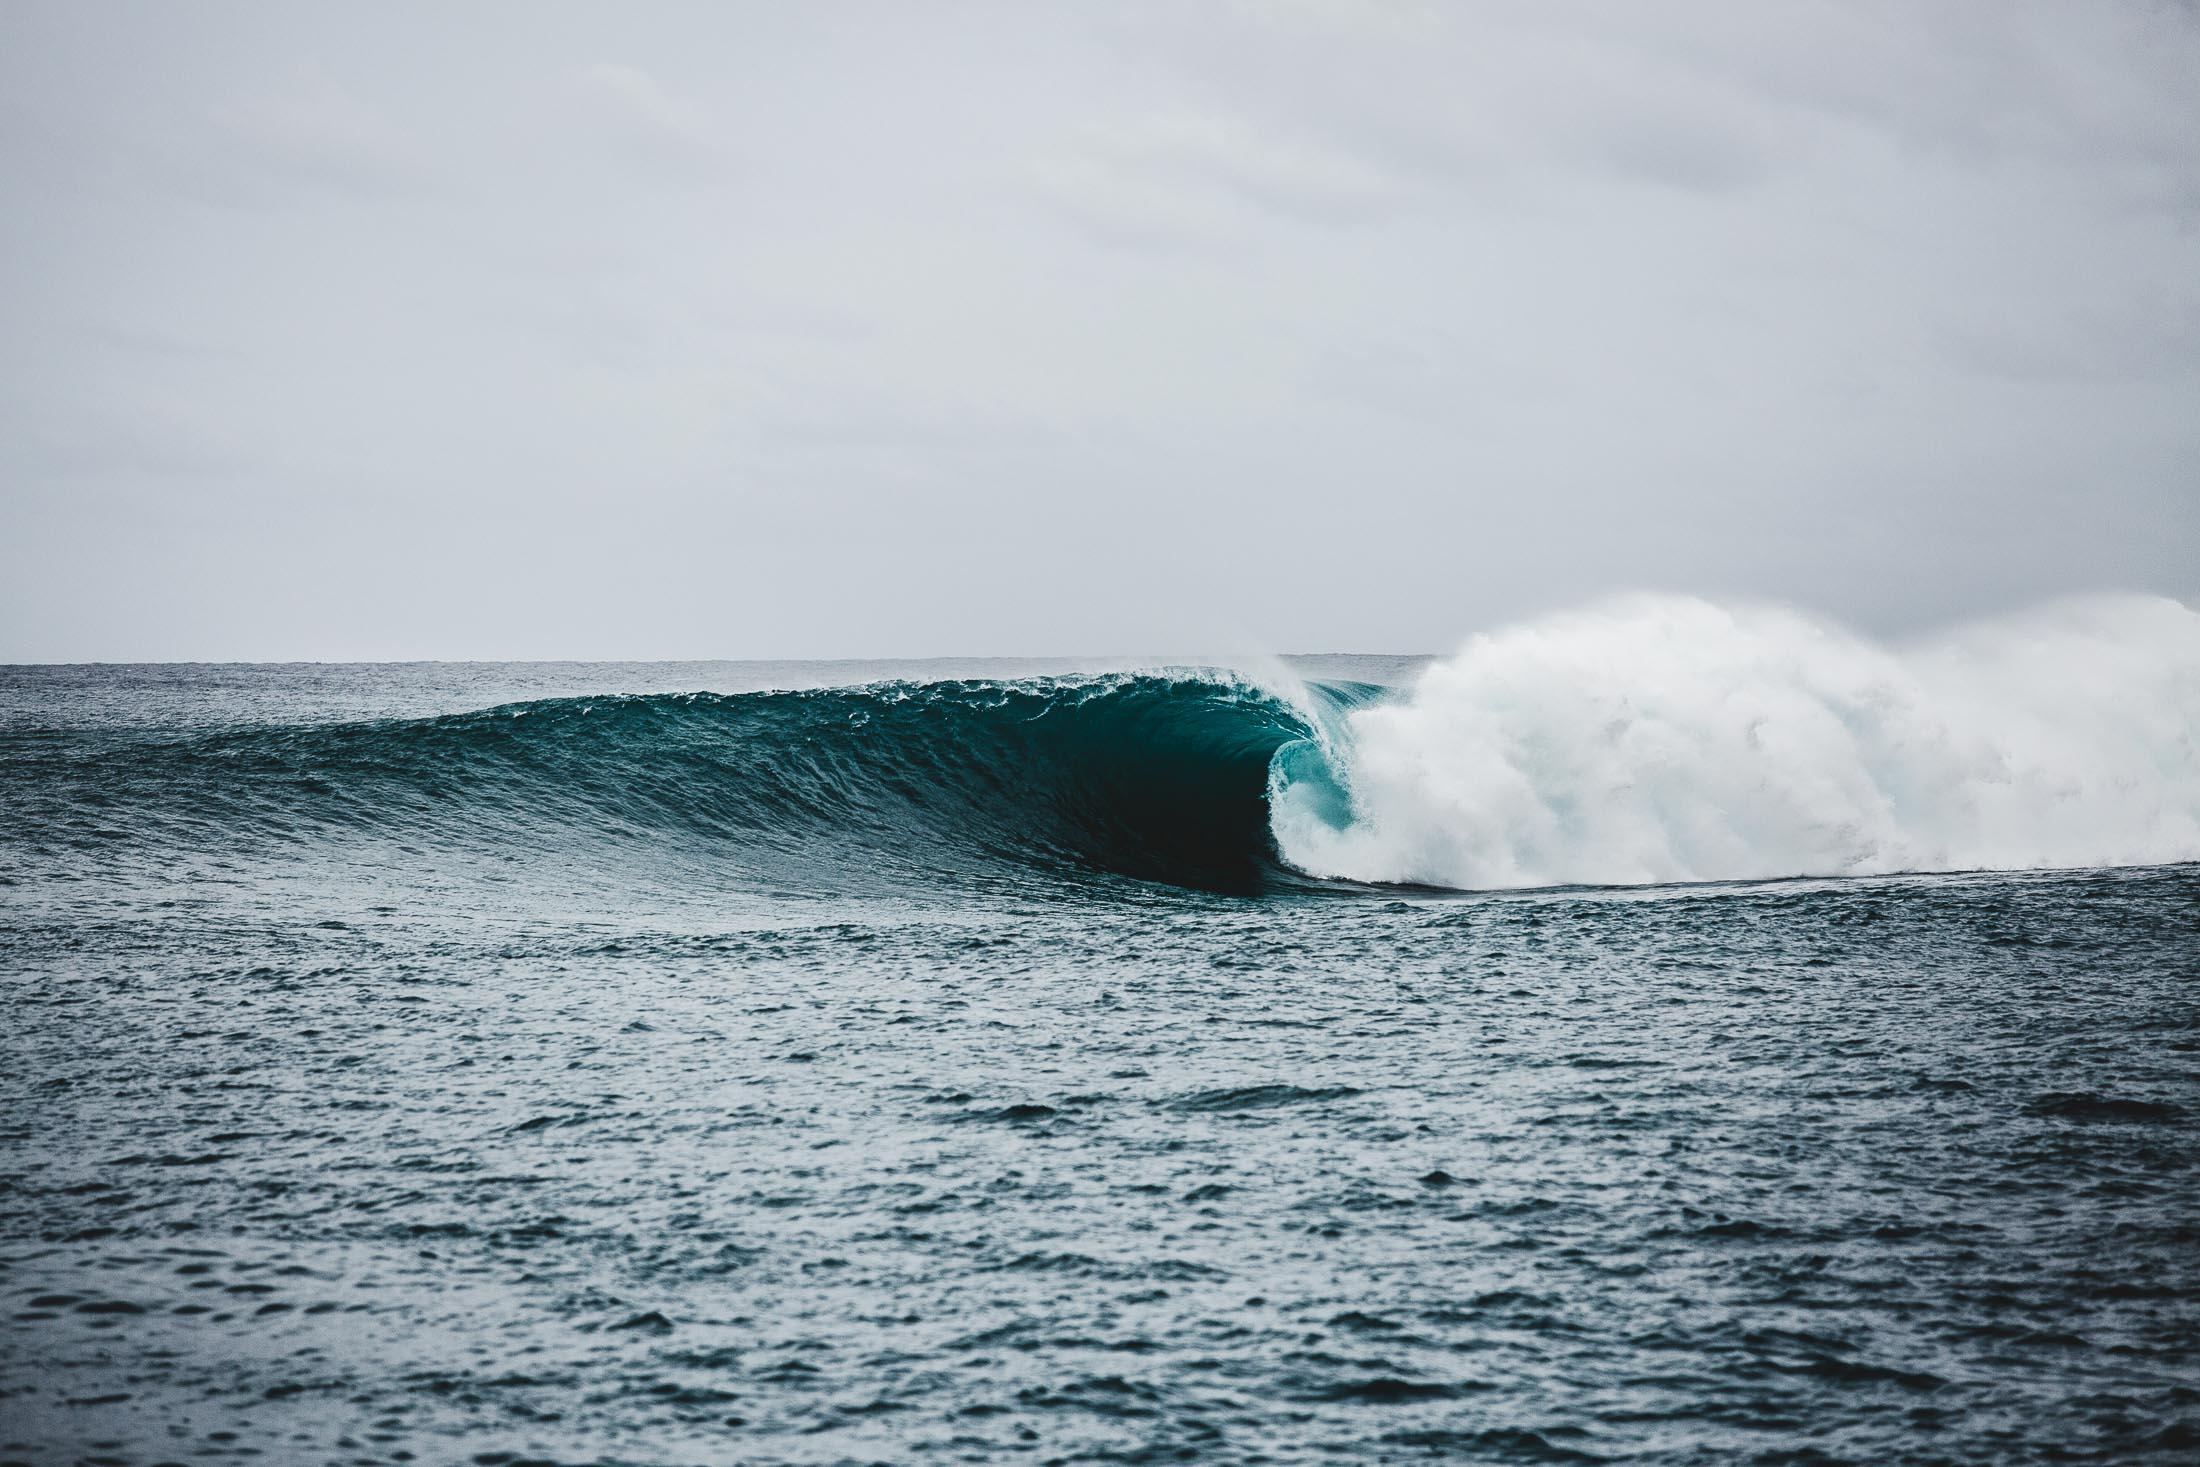 TELO ISLANDS 10